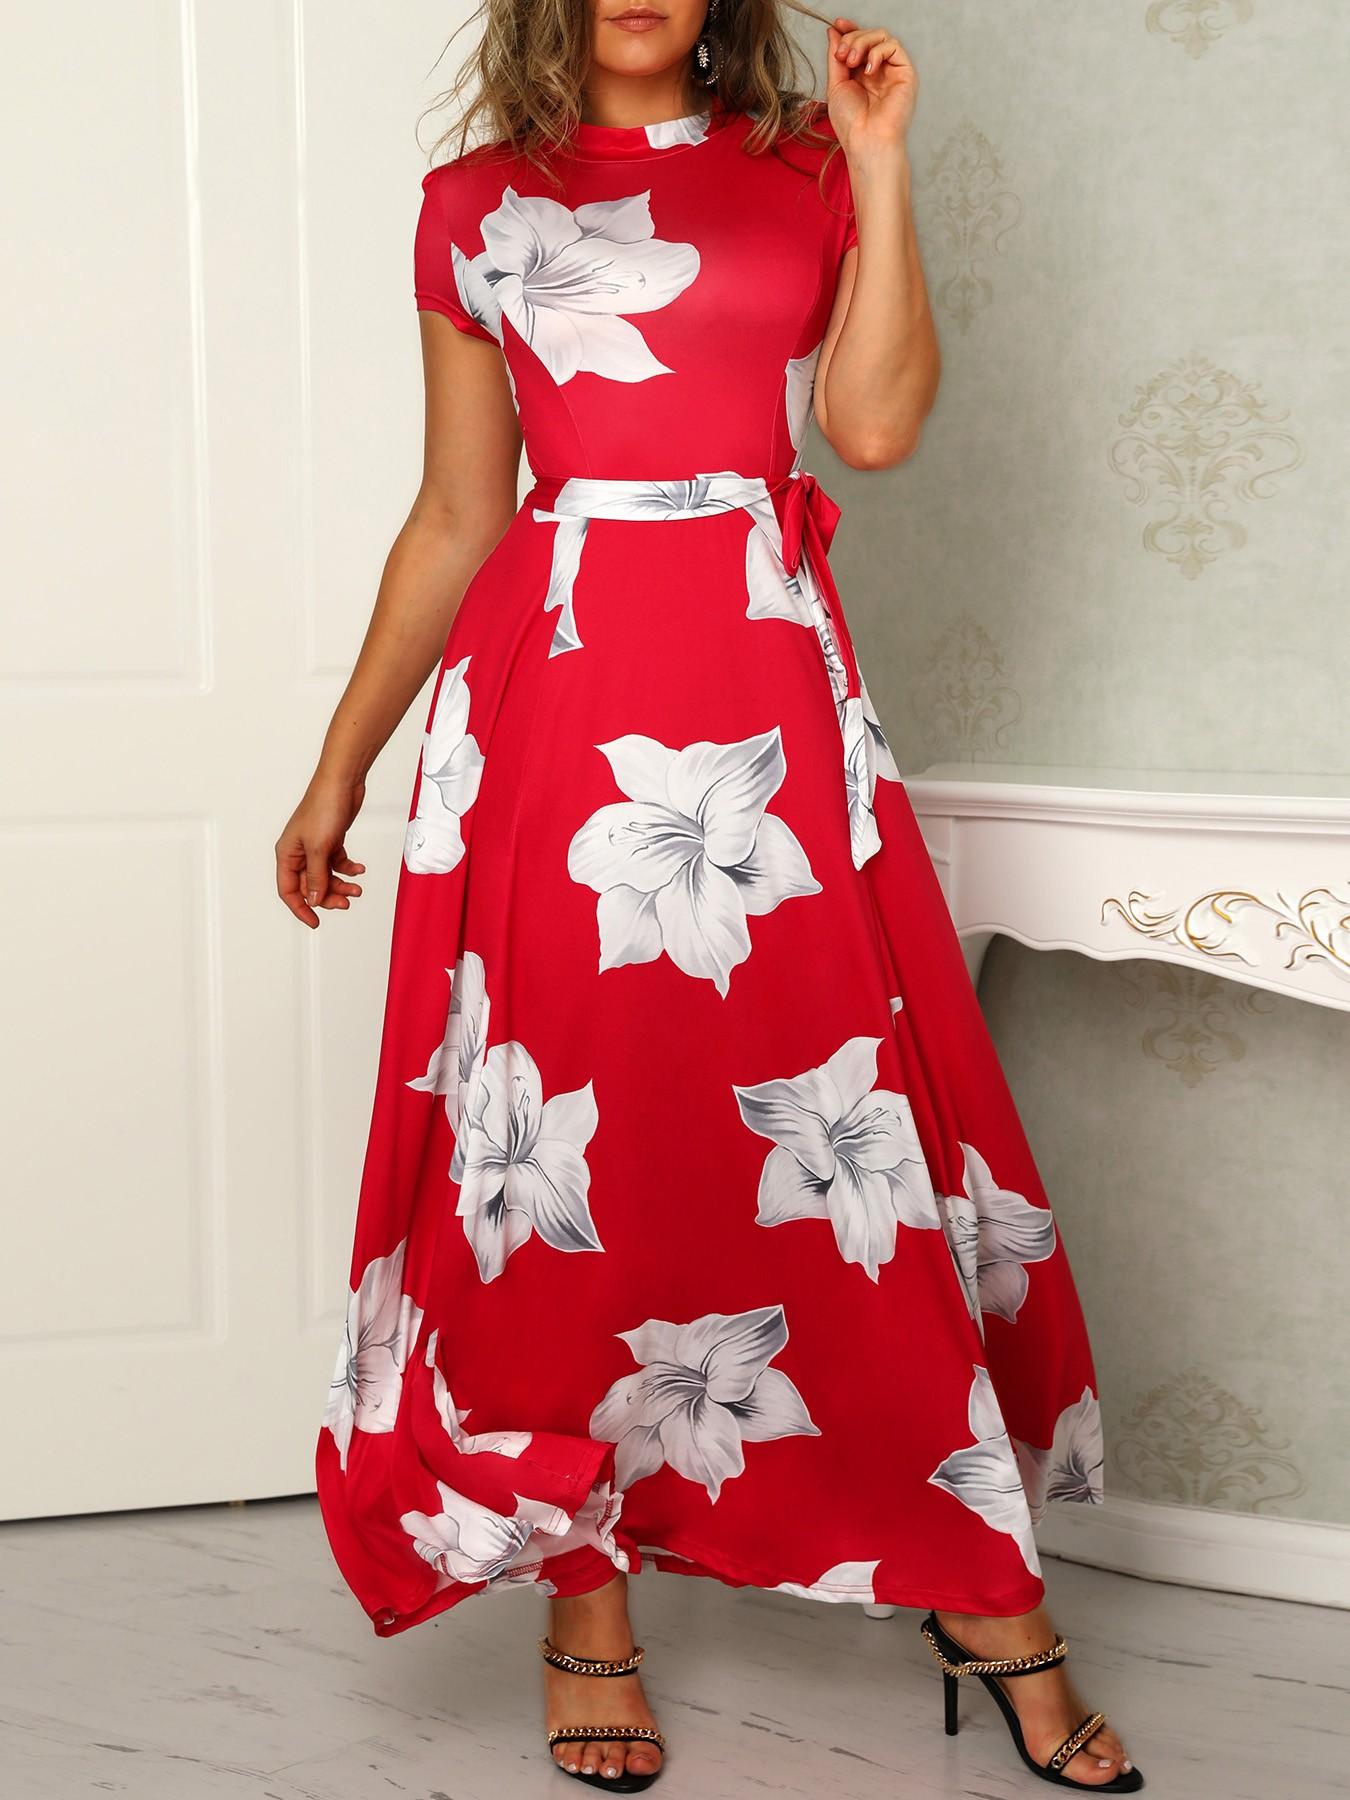 boutiquefeel / Floral Print Mock Neck Belted Ruched Maxi Dress